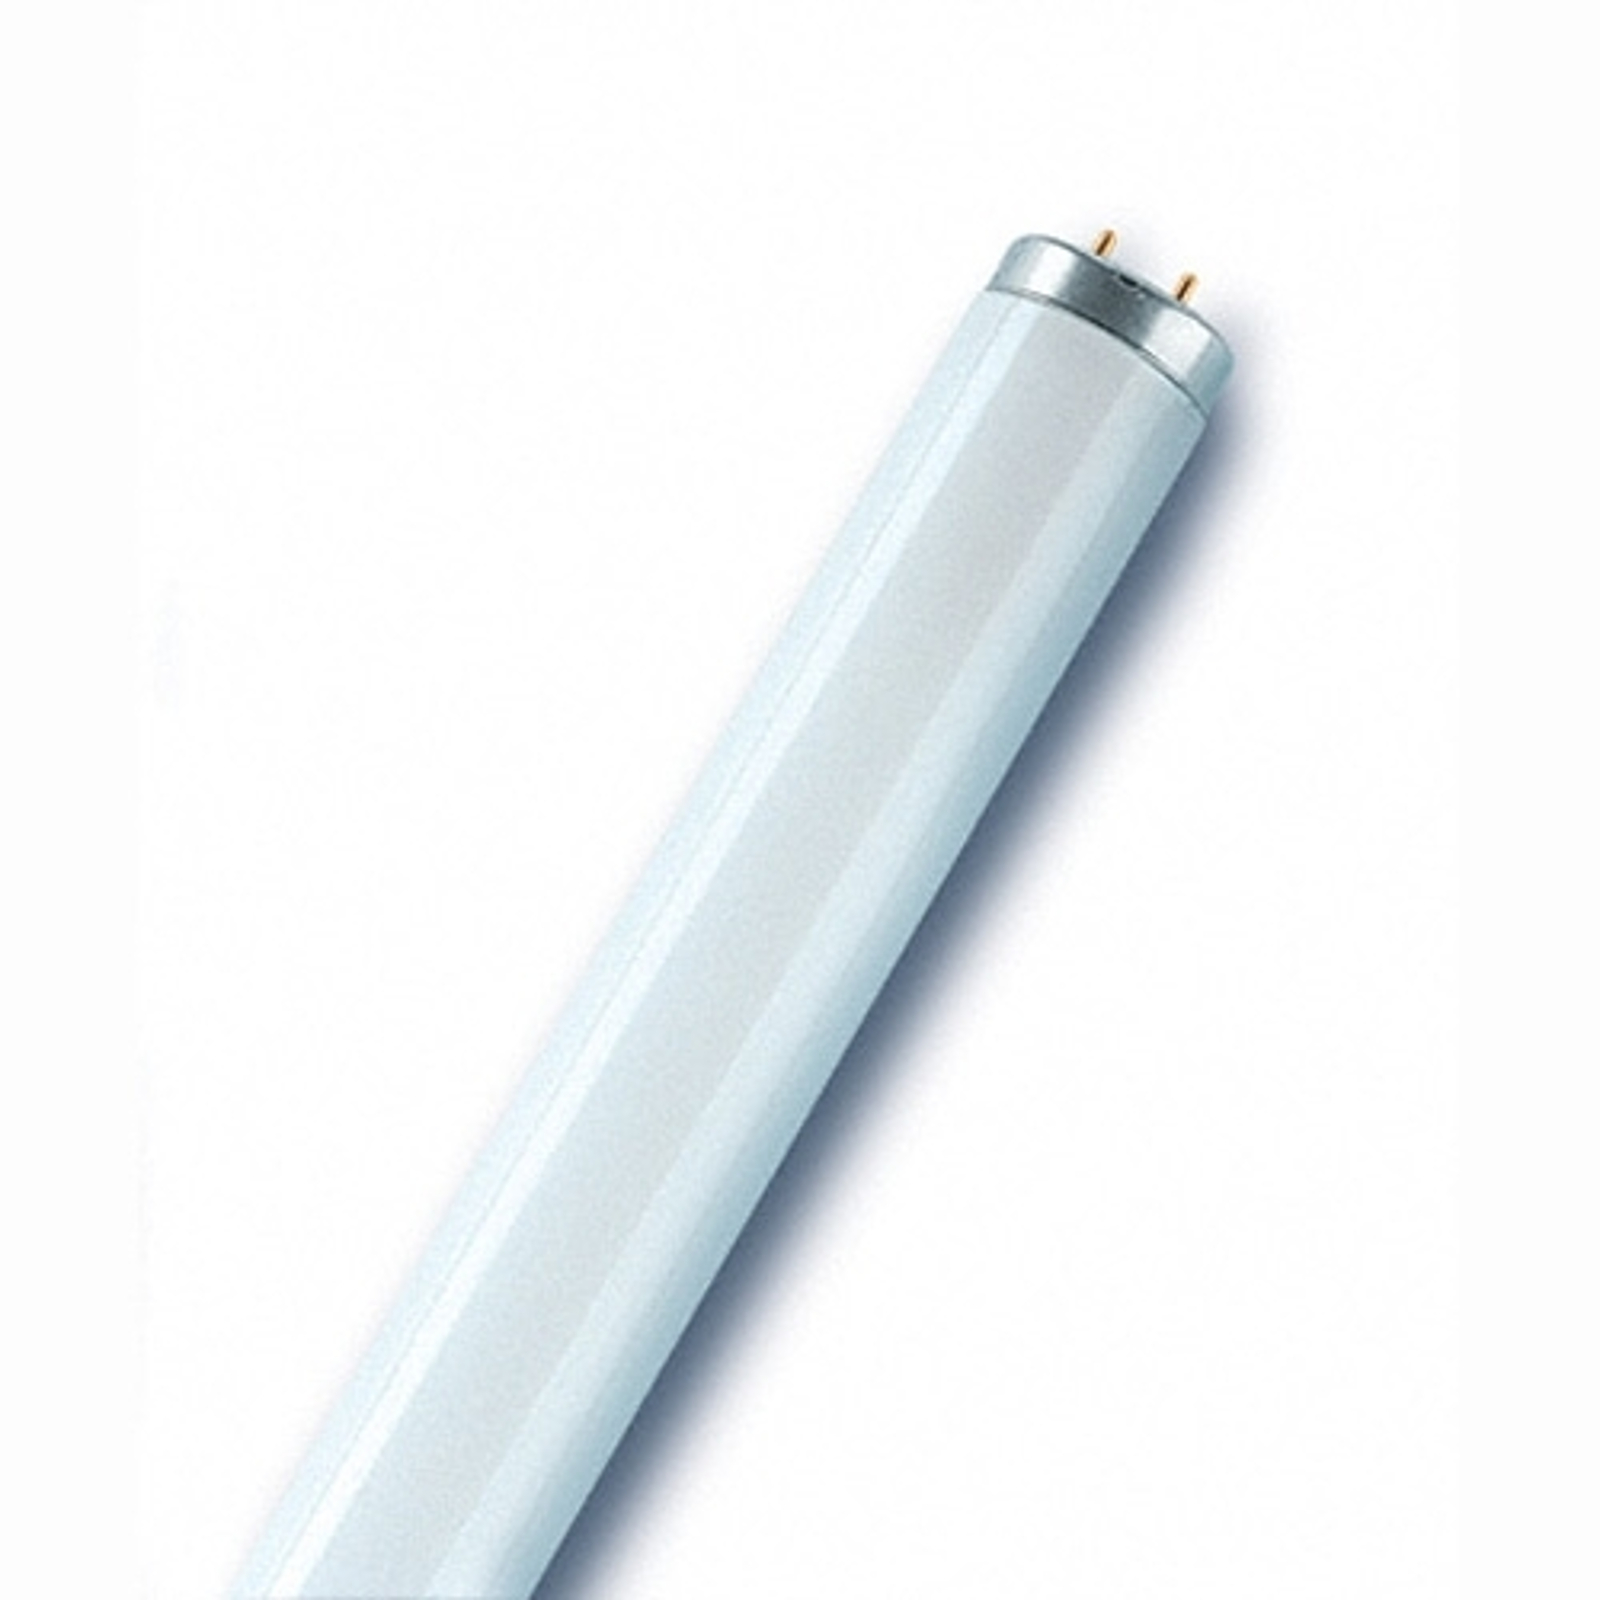 G13 T12 20W lysstoffpære SA-modell